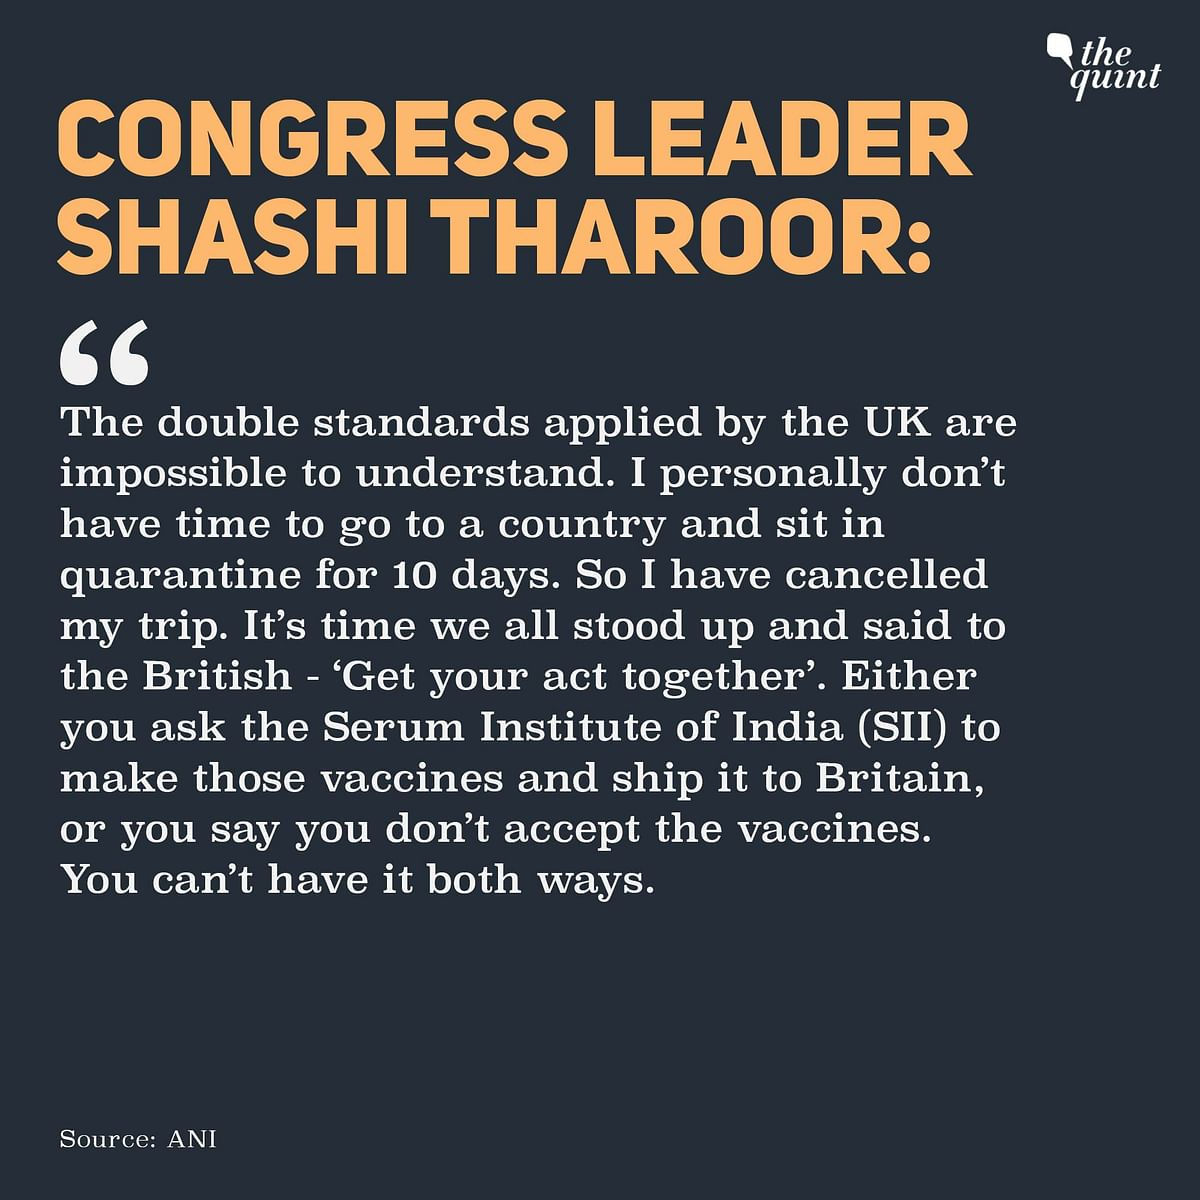 India-UK Travel Row: From PM Modi to Shashi Tharoor, Who Said What